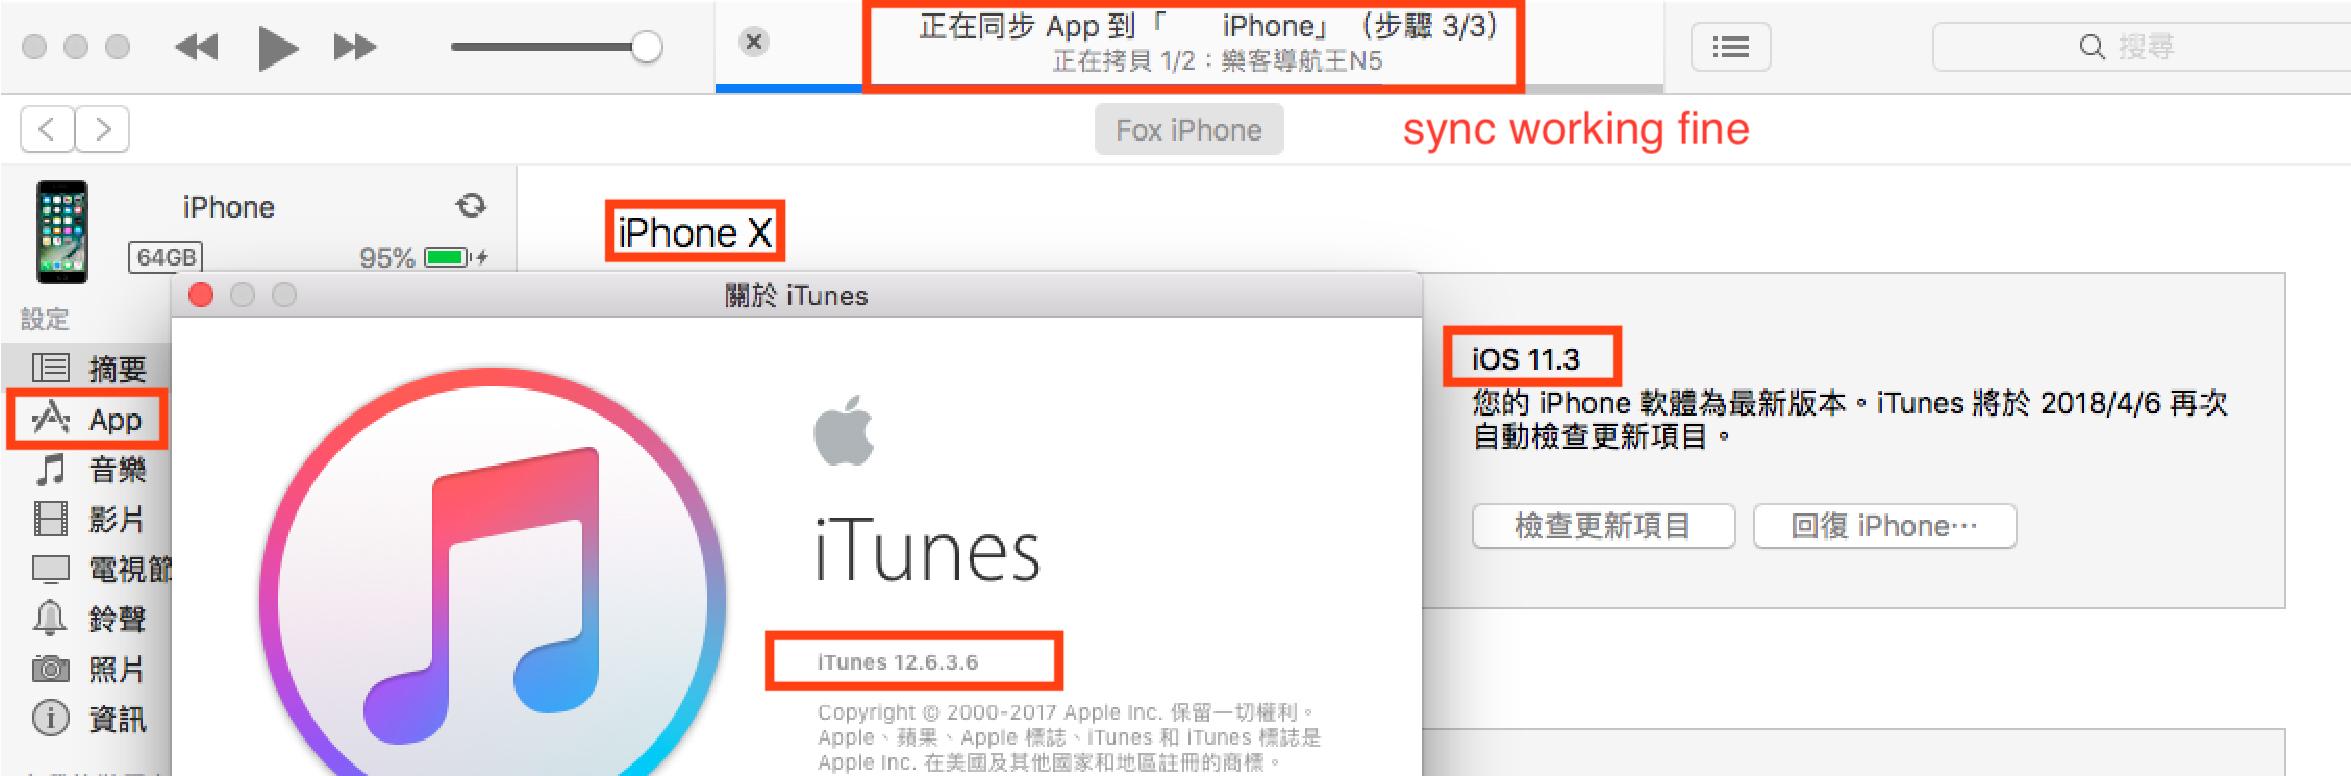 itunes 12.6.4 download mac